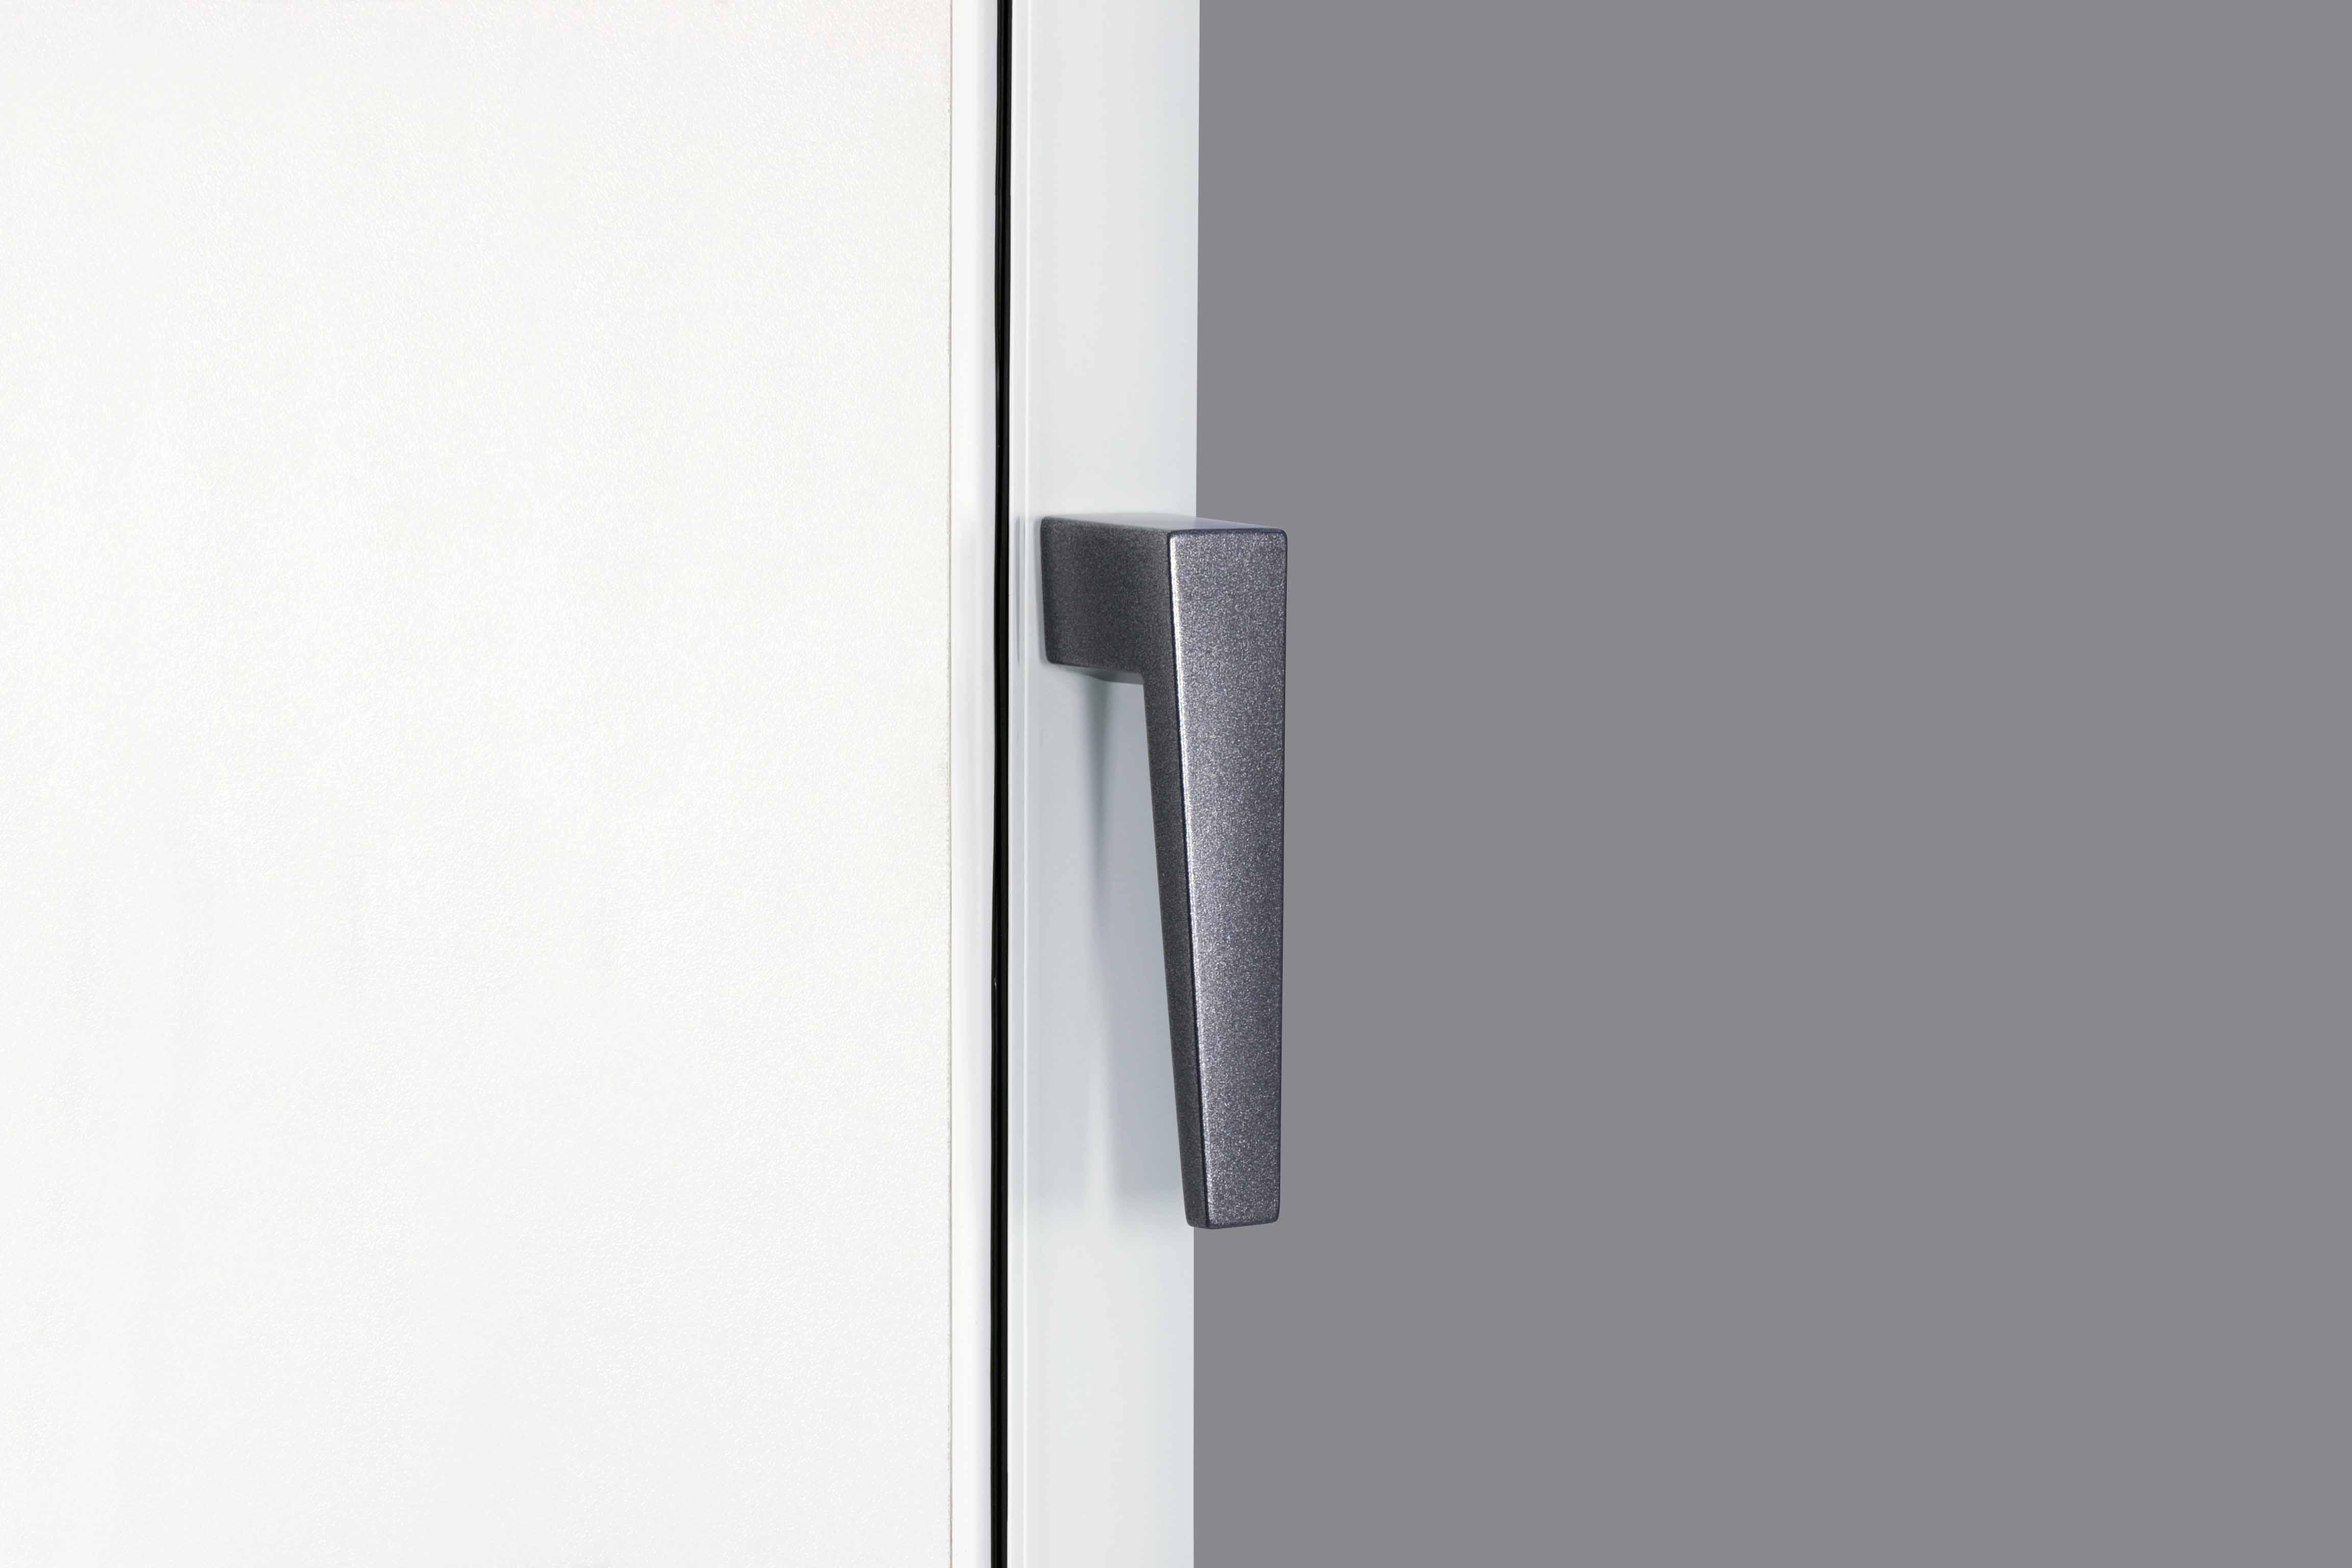 Essenza presents Zero Frame technology